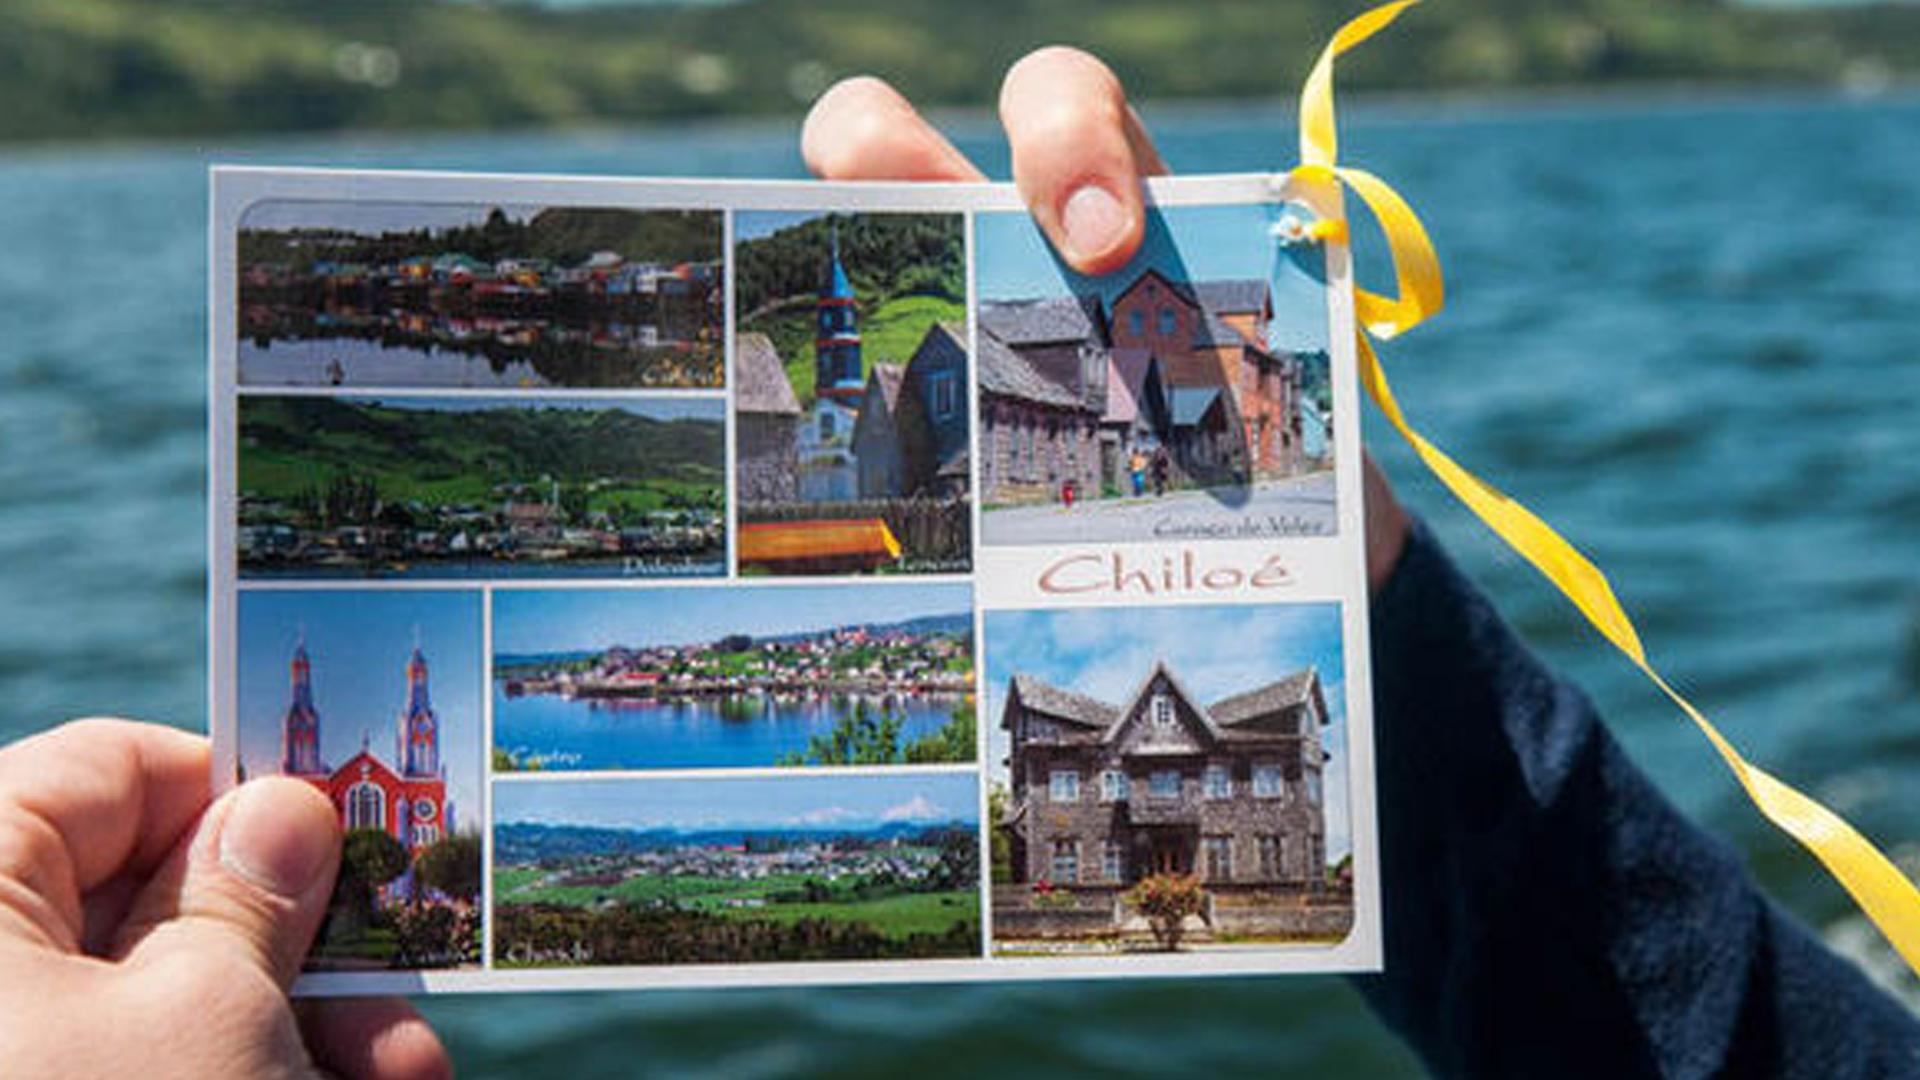 postcard-594325.jpg